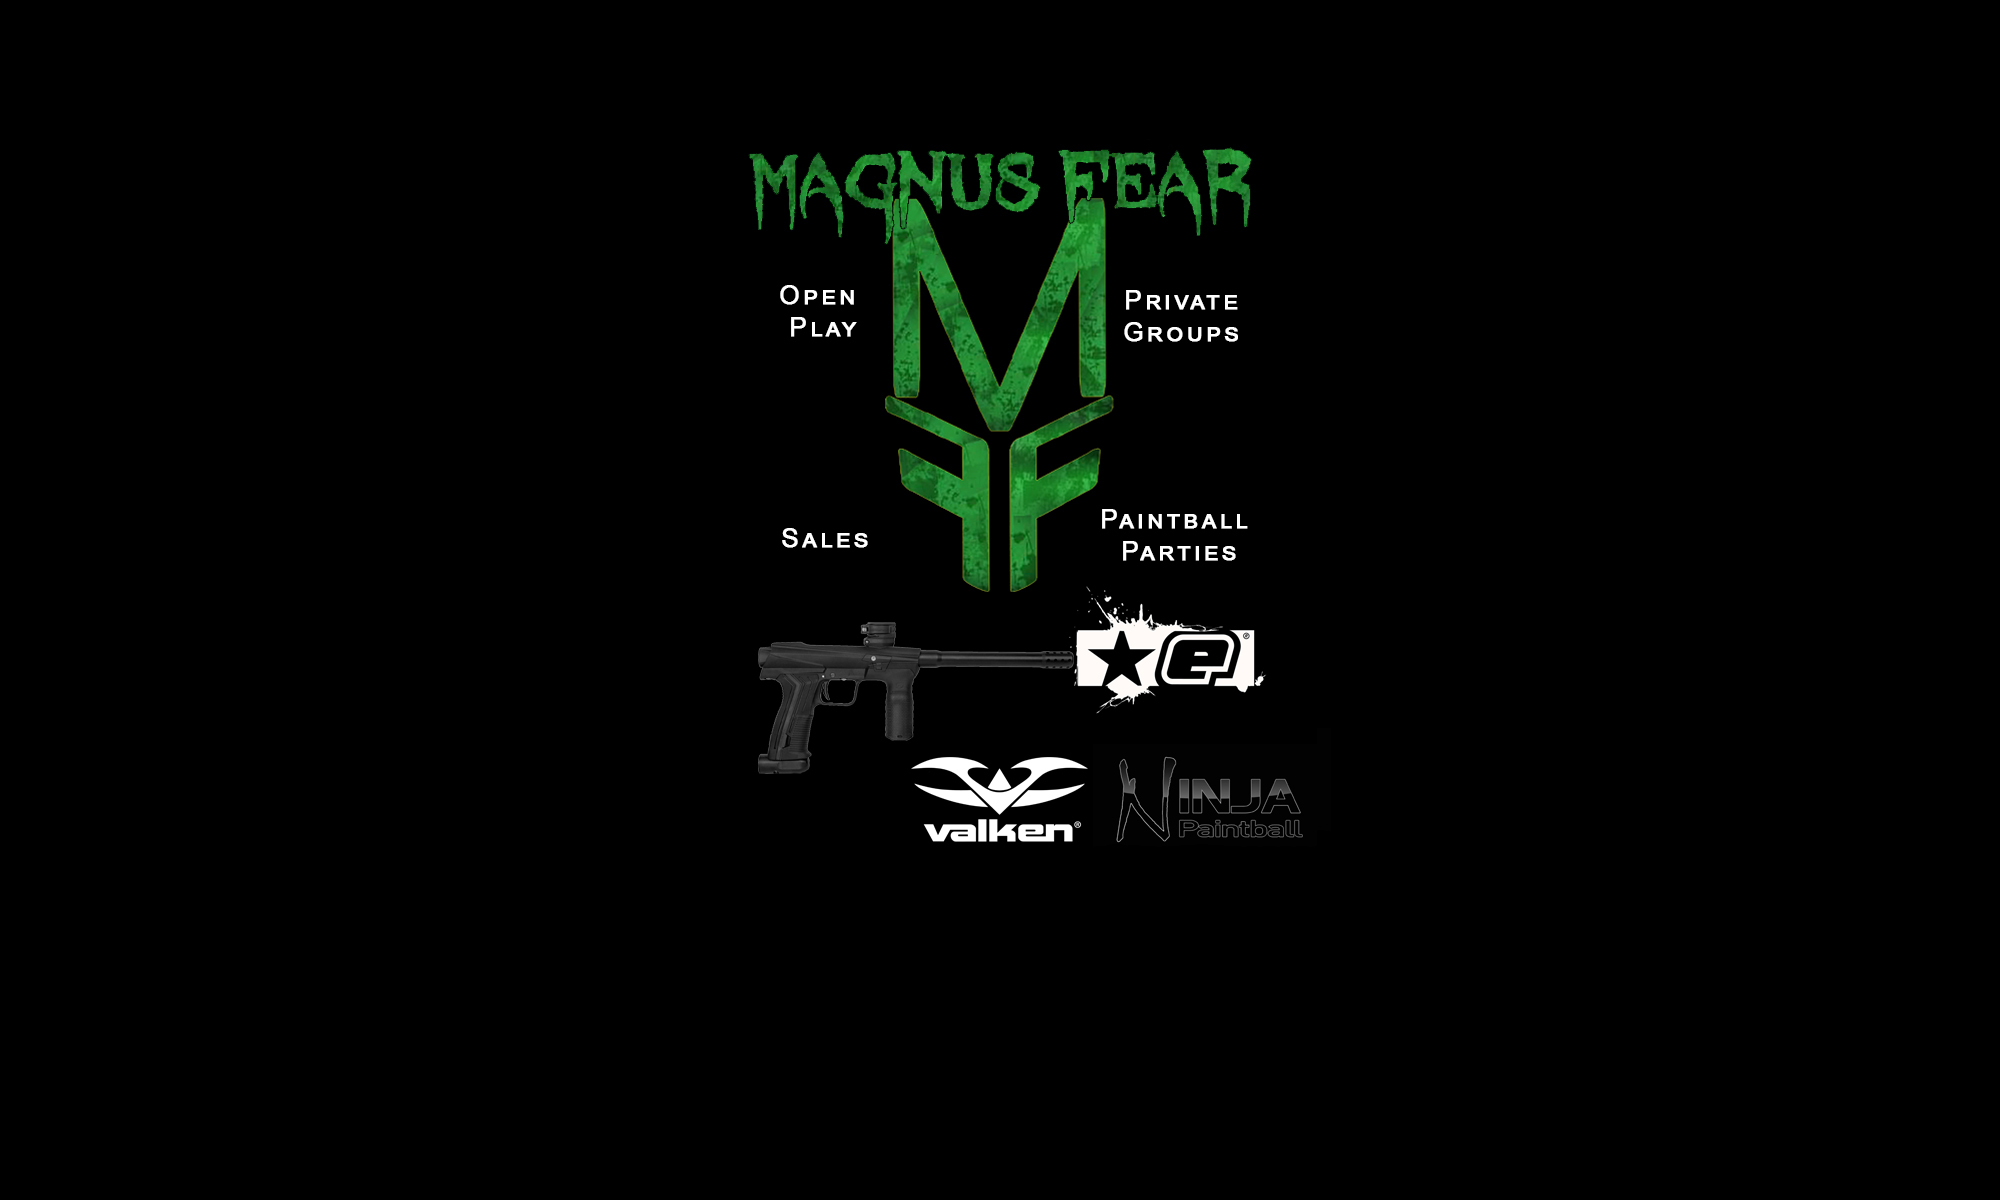 Magnus Fear LLC